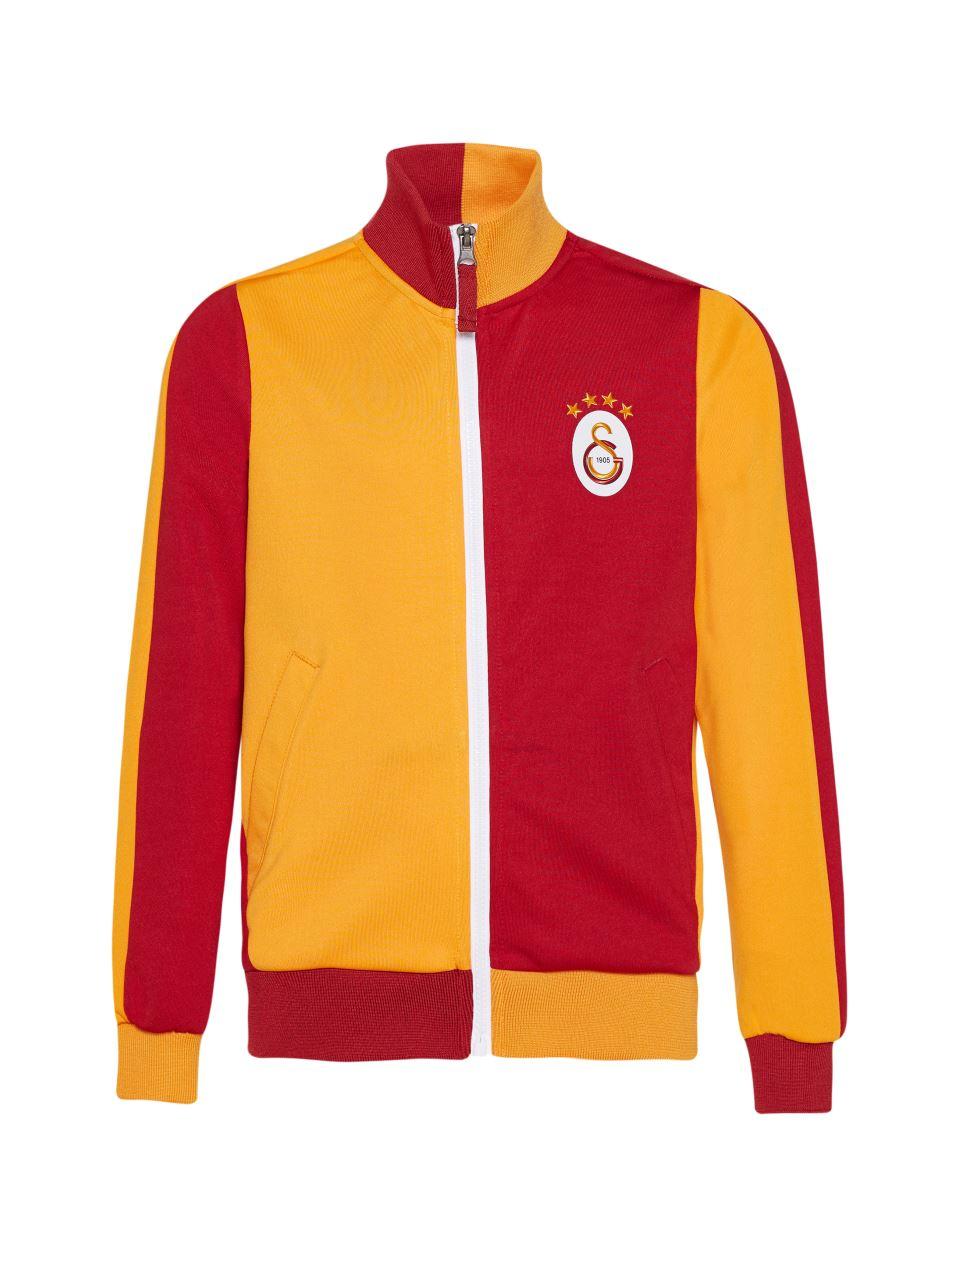 Galatasaray Taraftar Çocuk Ceket C191228